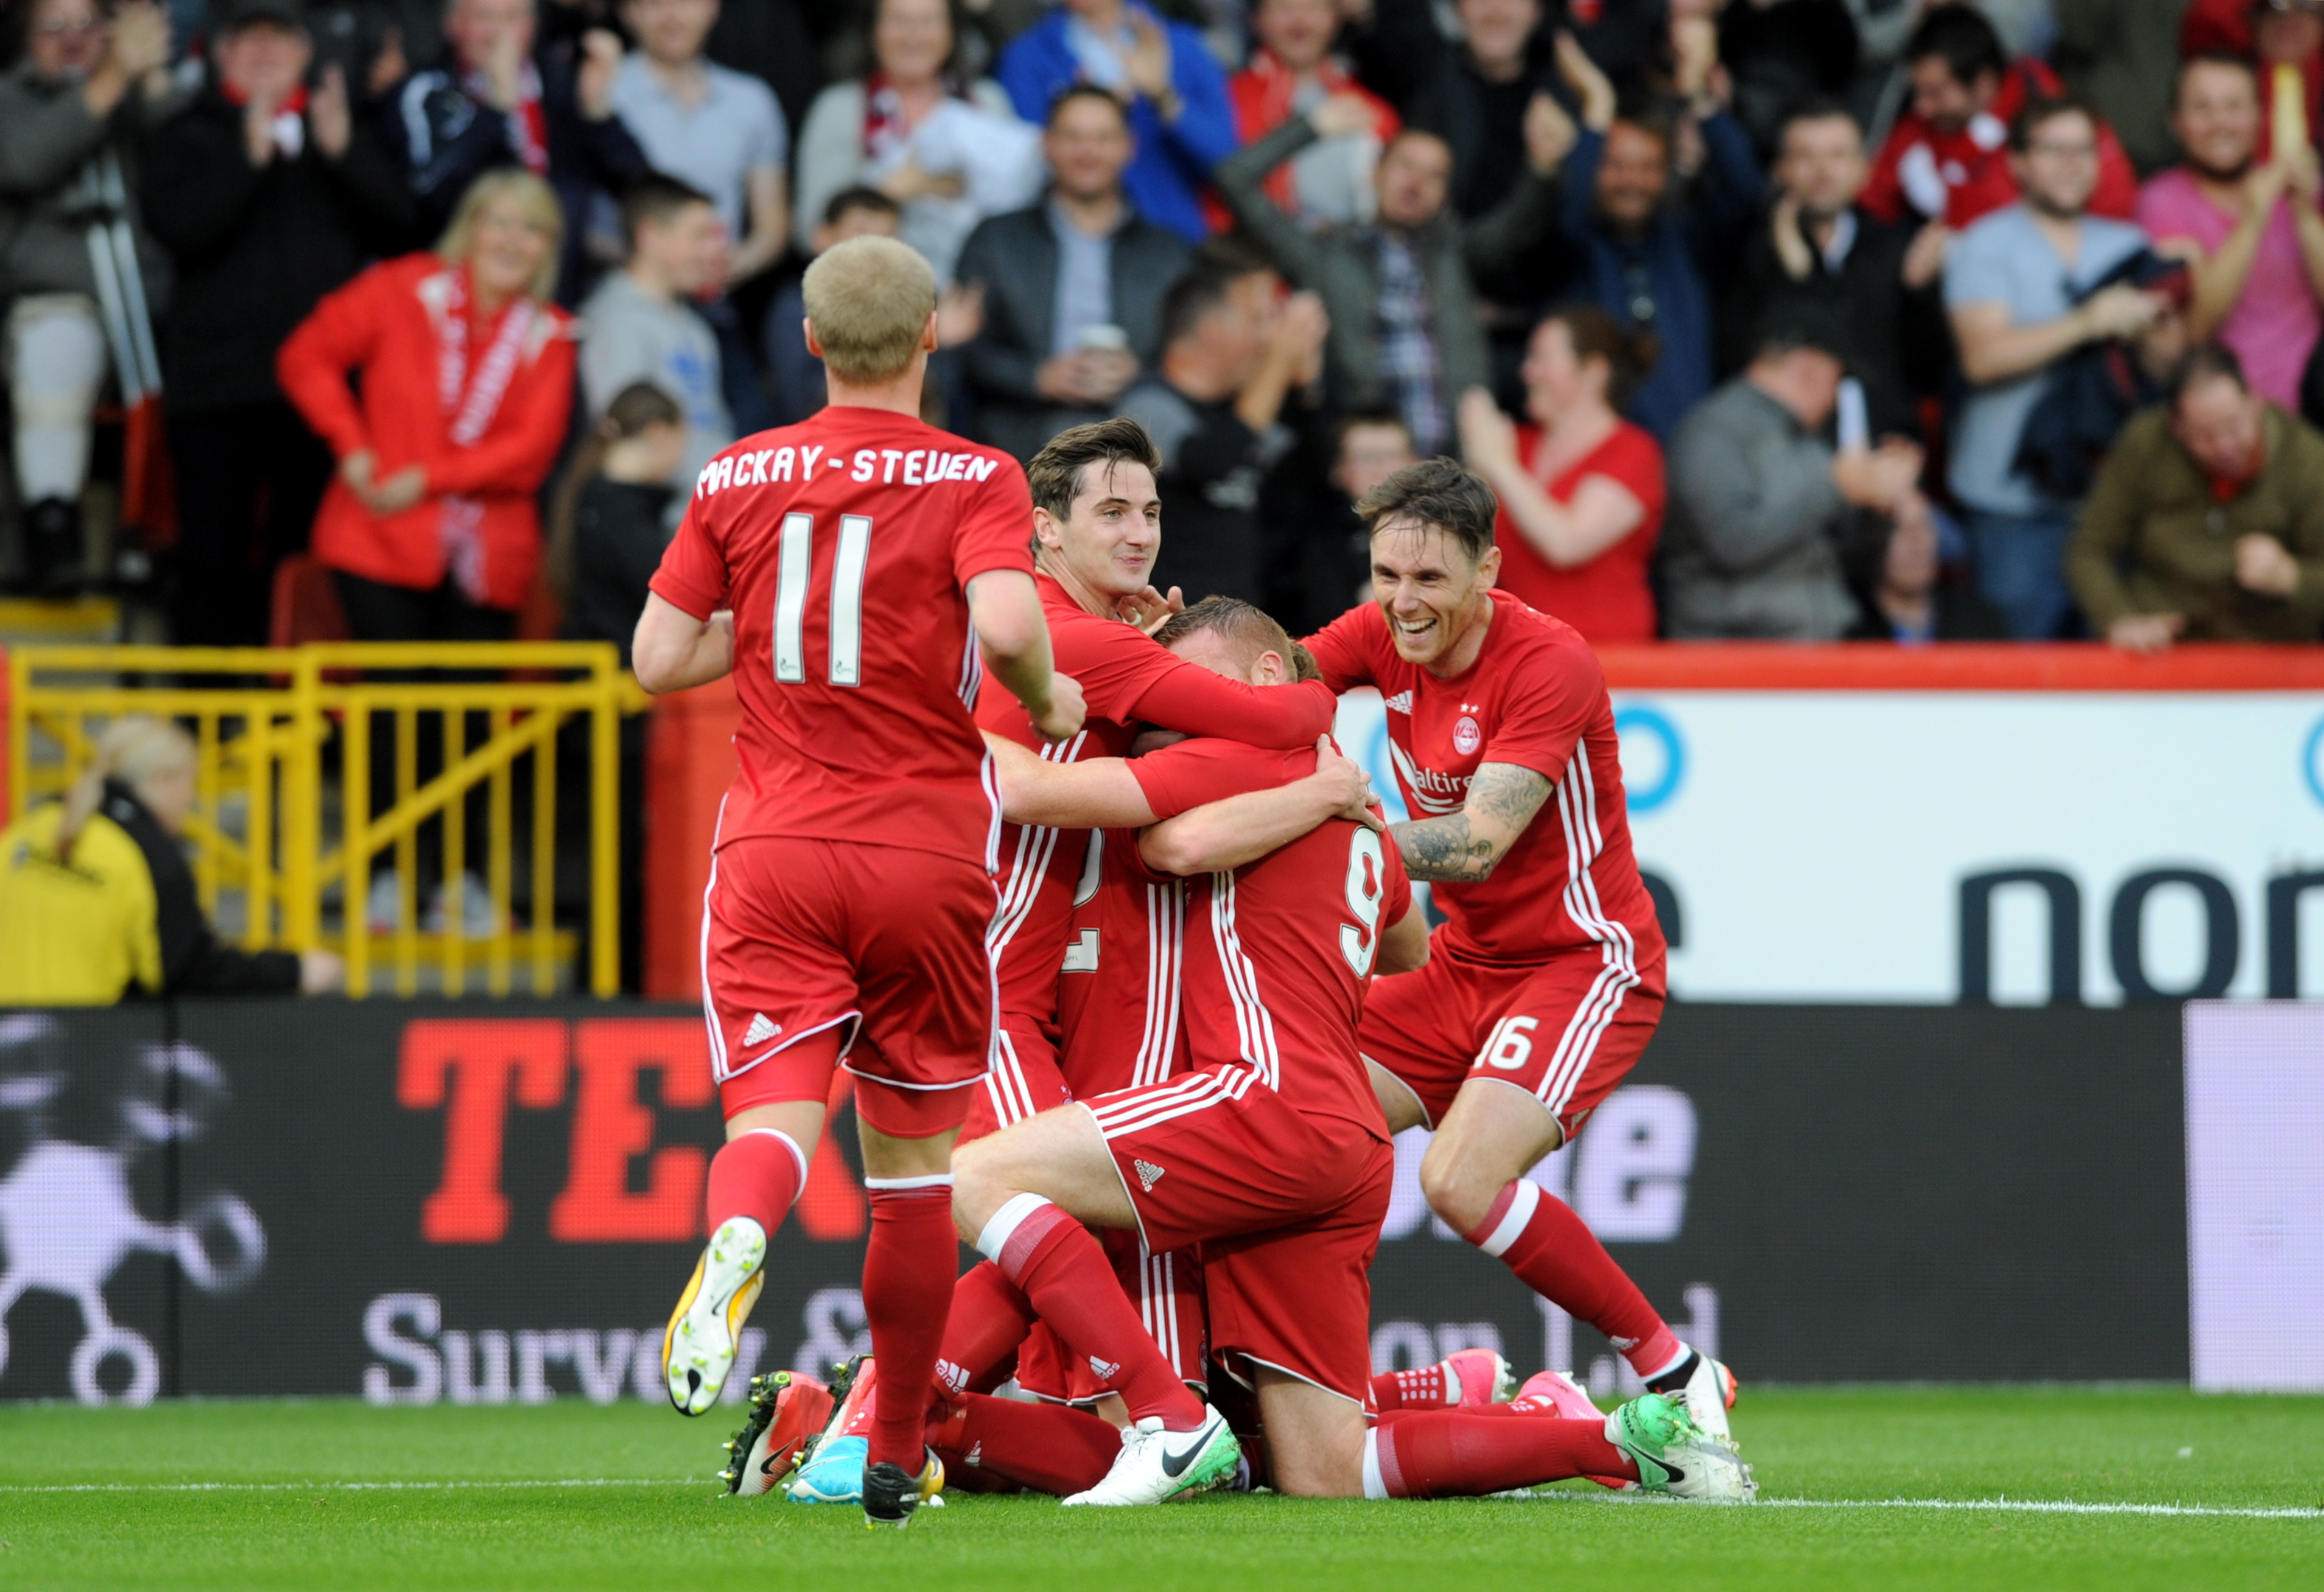 Ryan Christie celebrating scoring the first goal of the match against Siroki Brijeg.